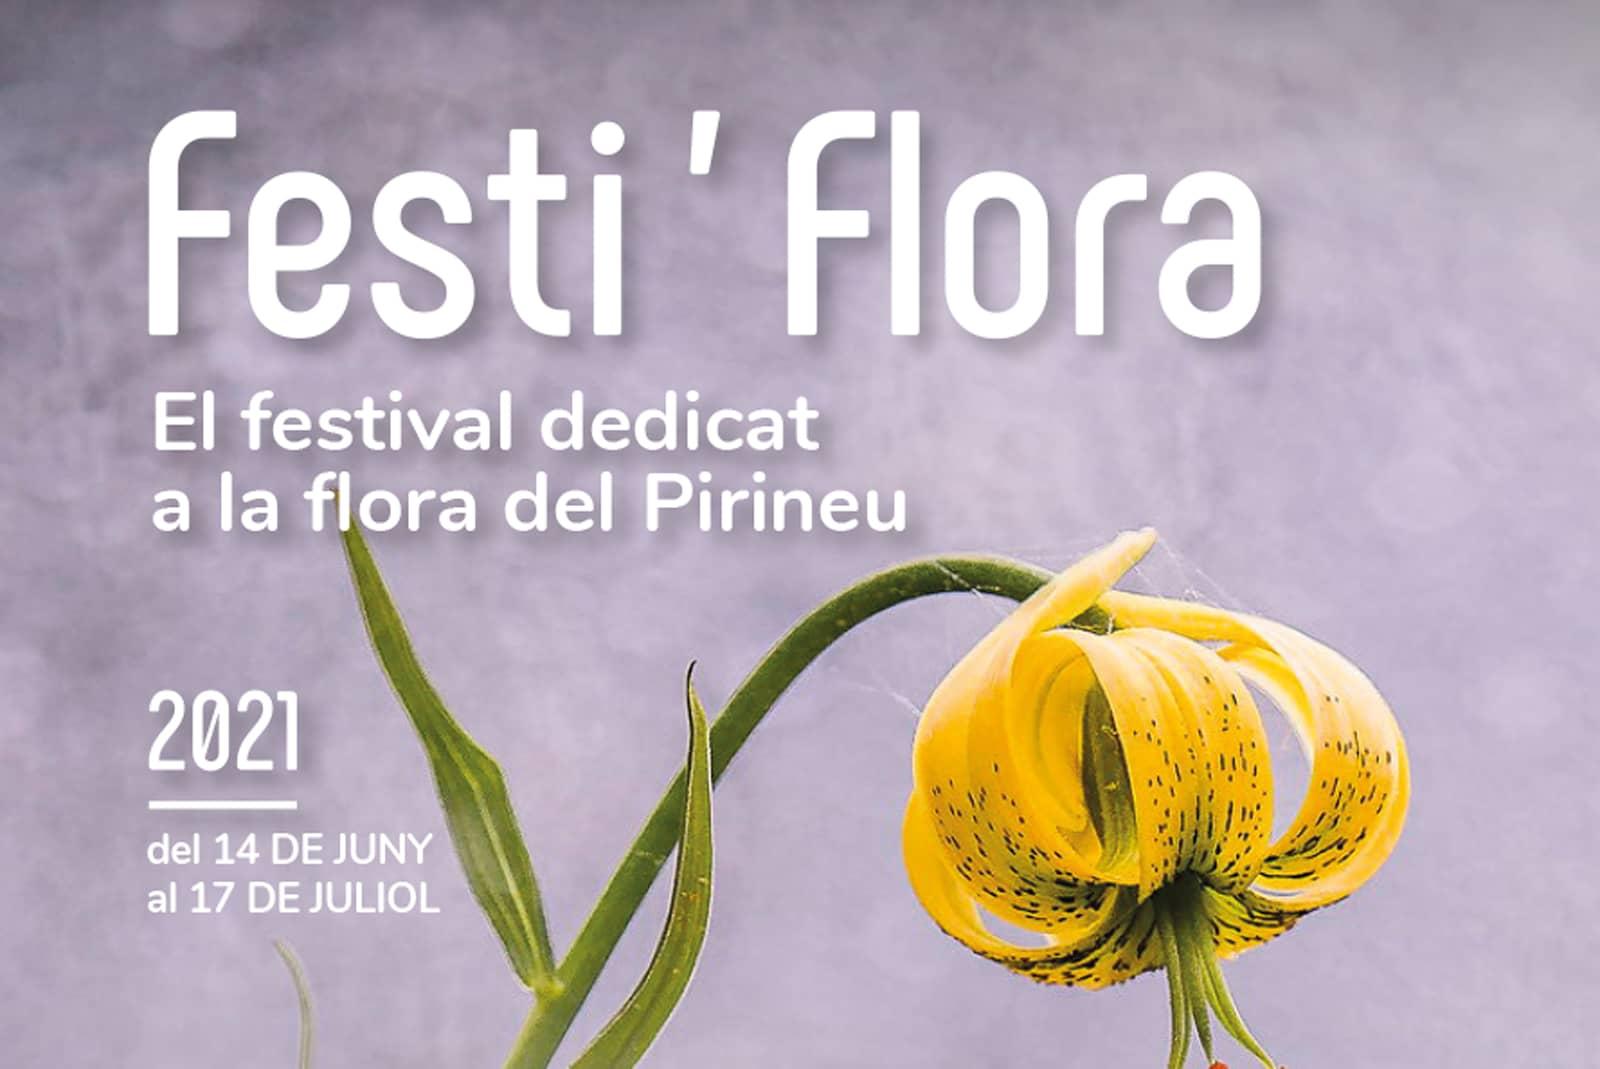 Poster Festi'flora 2021